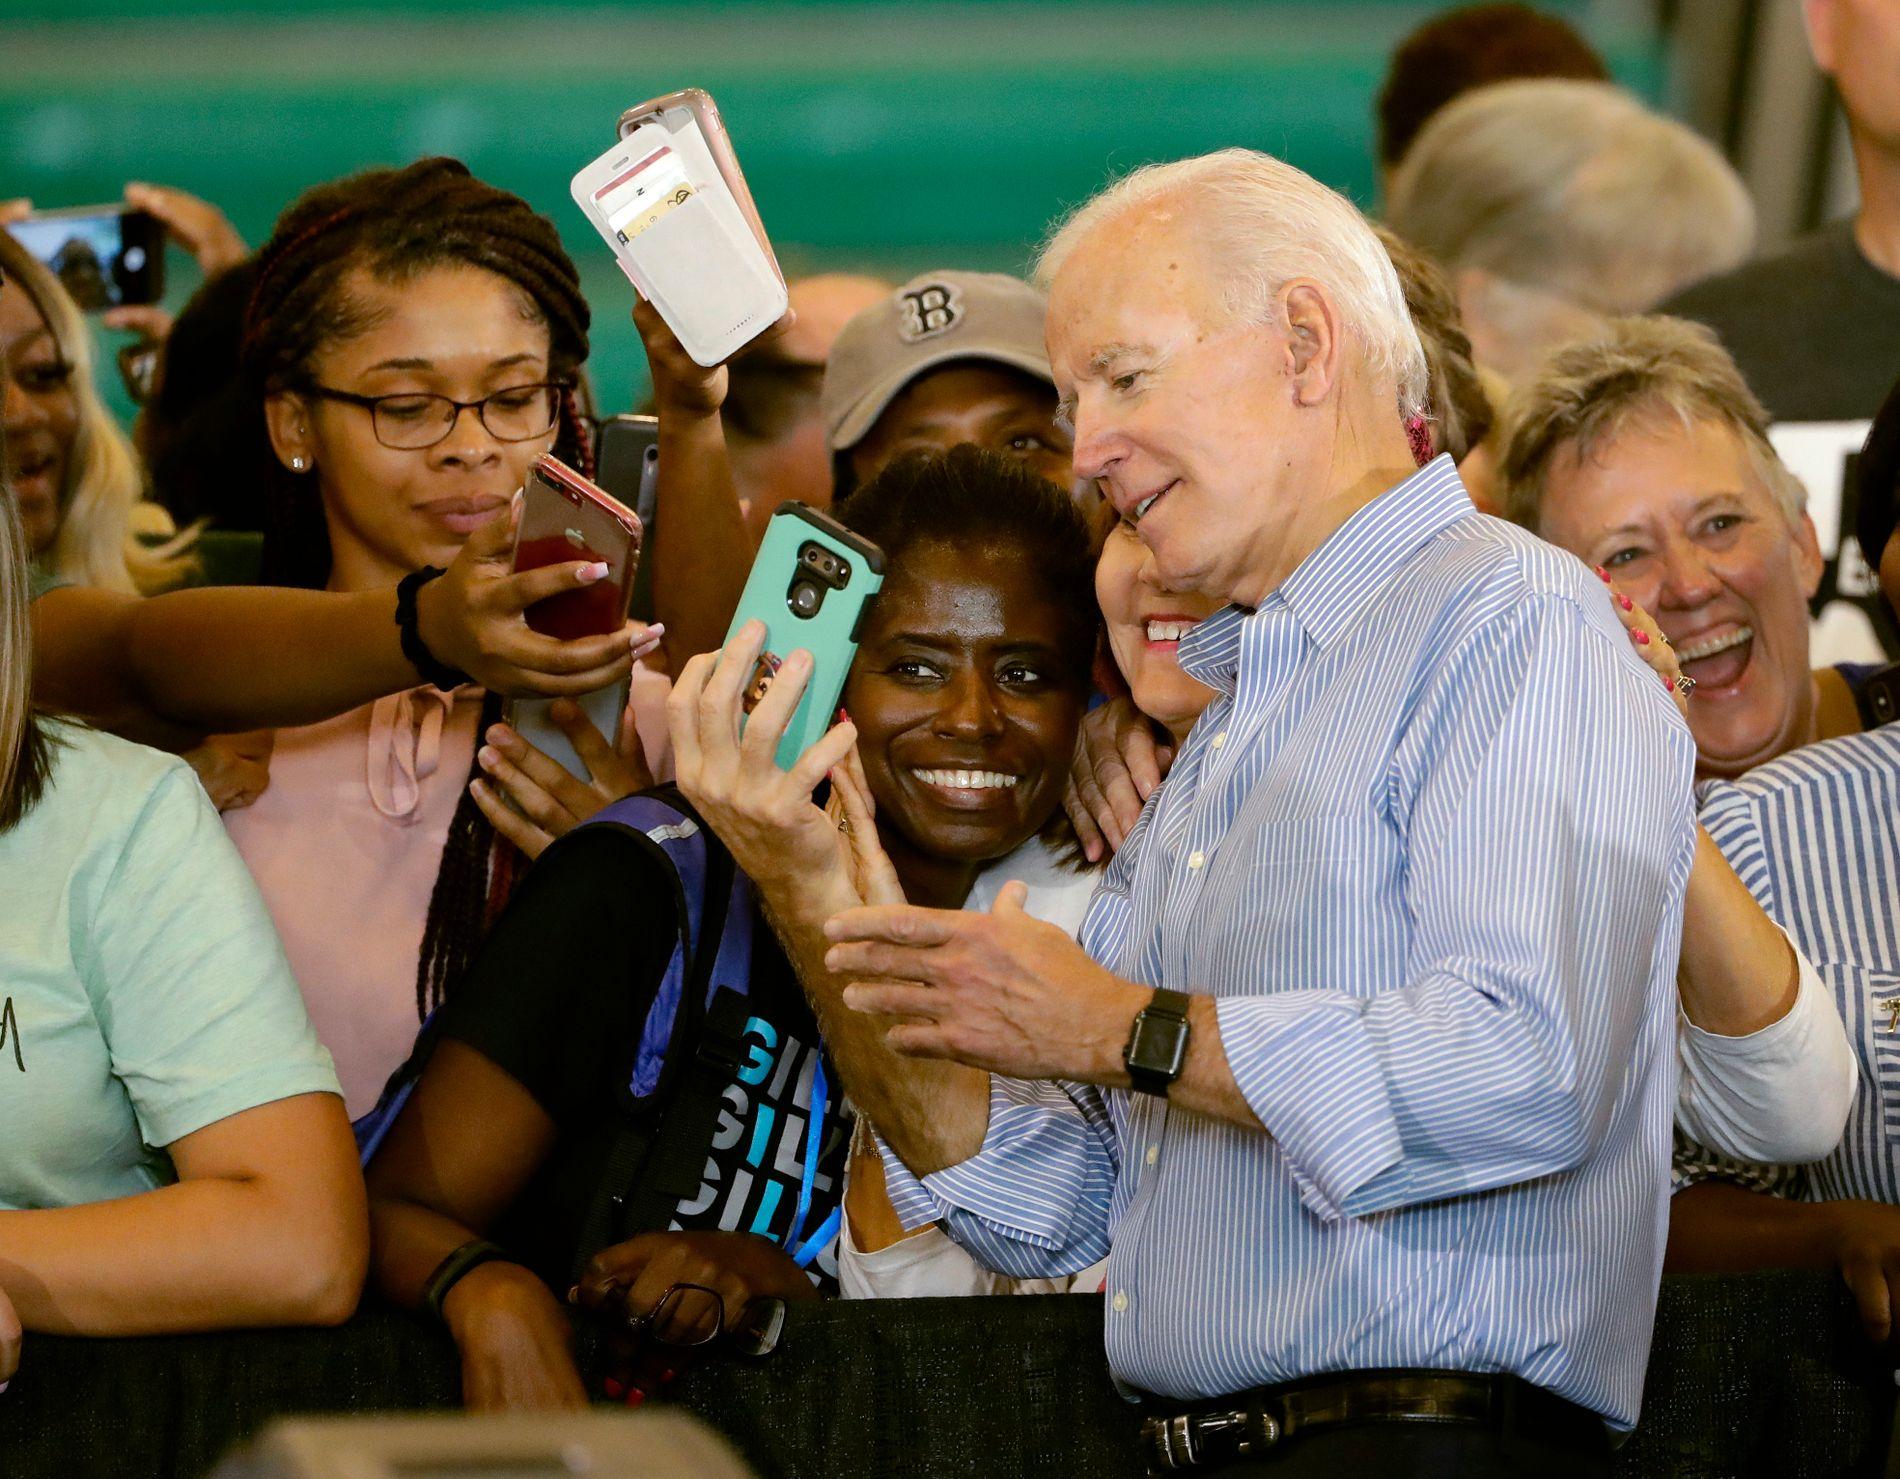 TIDLIGERE VISEPRESIDENT: Demokraten Joe Biden deltar under et politisk arrangement på University of South Florida.